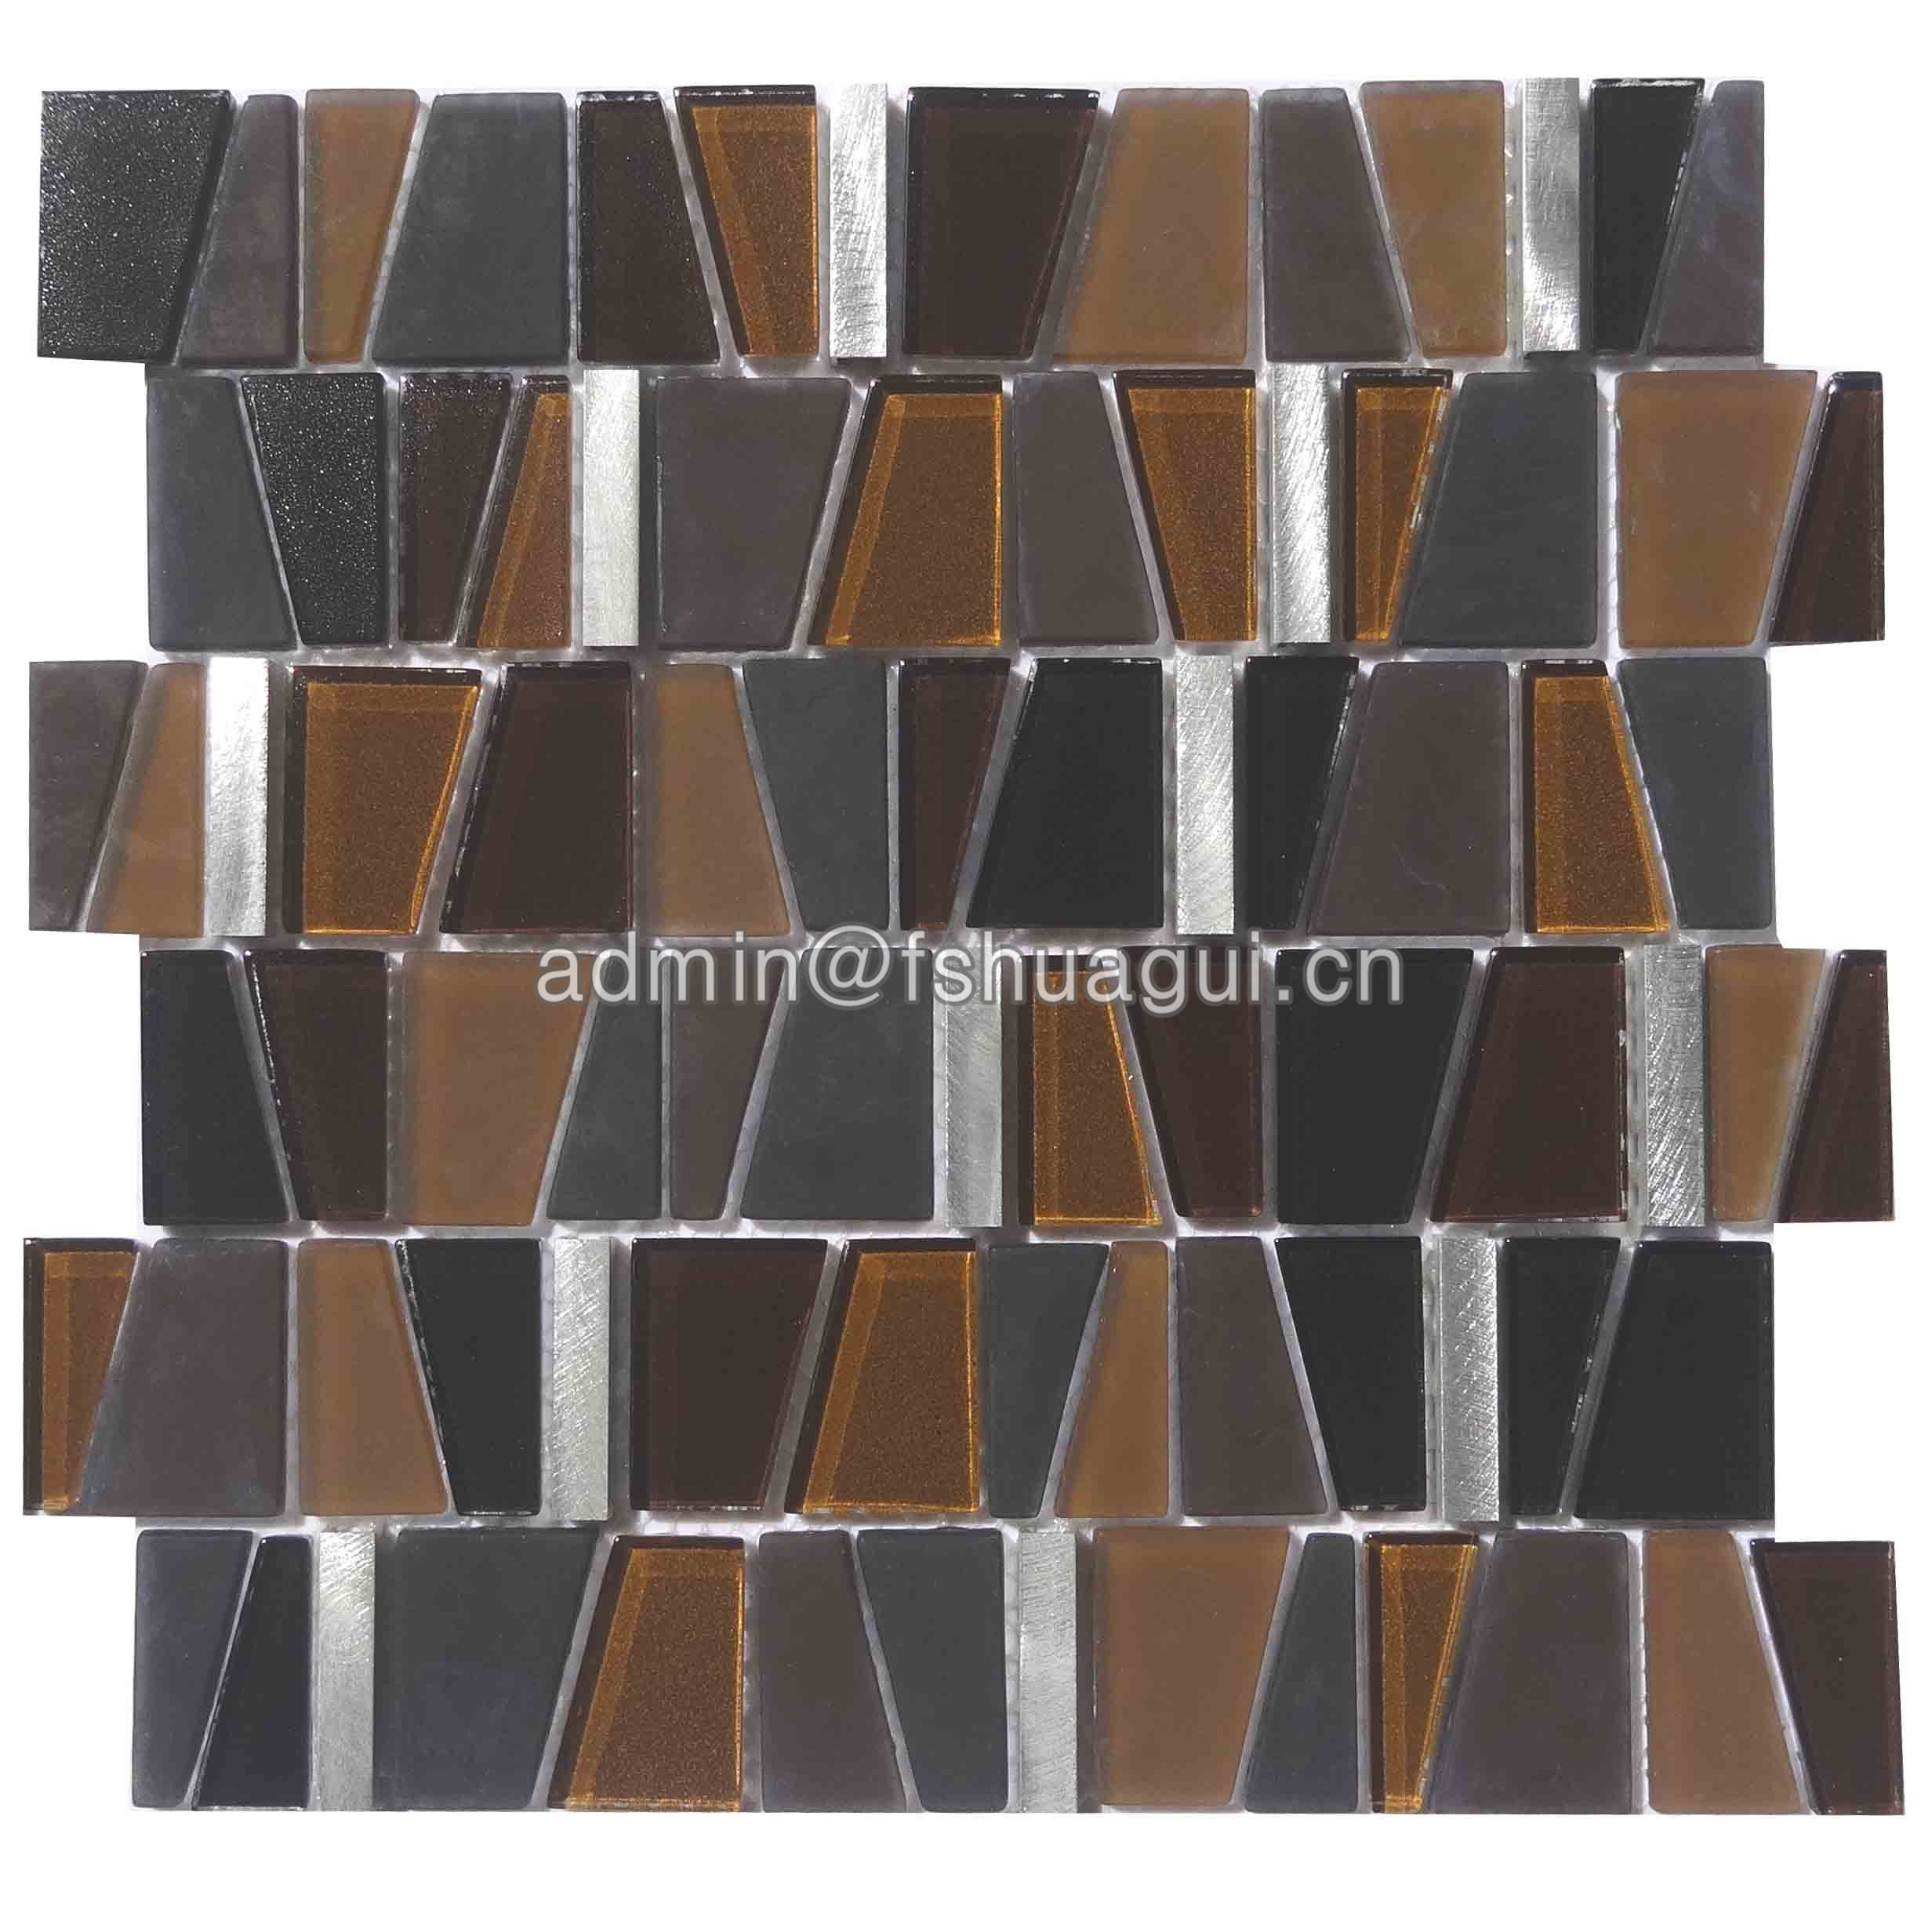 Huagui Glass Metal Mosaic Wall Tile HG-YA003 METAL MOSAIC TILE image4